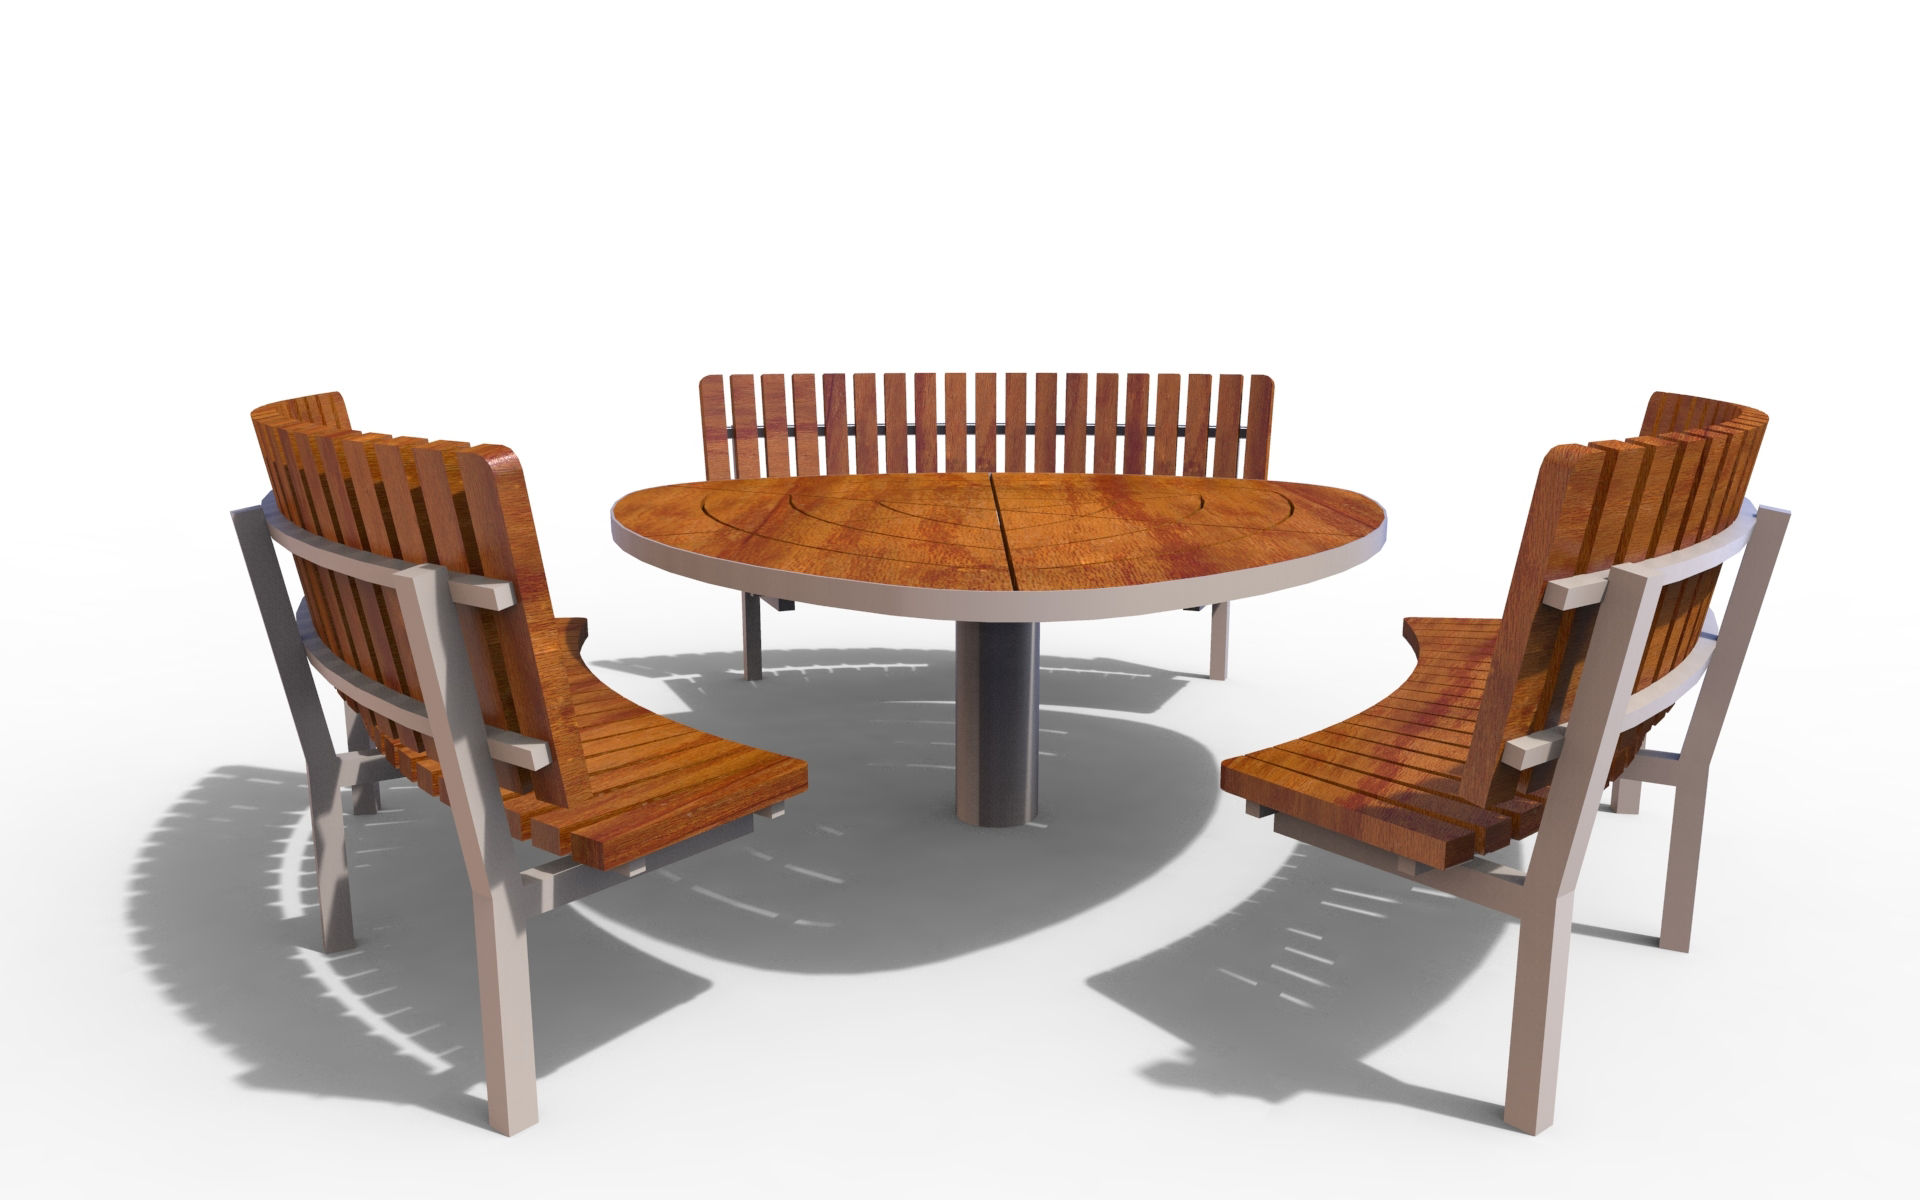 Изображение seating / table 21-04-07_02 (Komplet piknikowy)